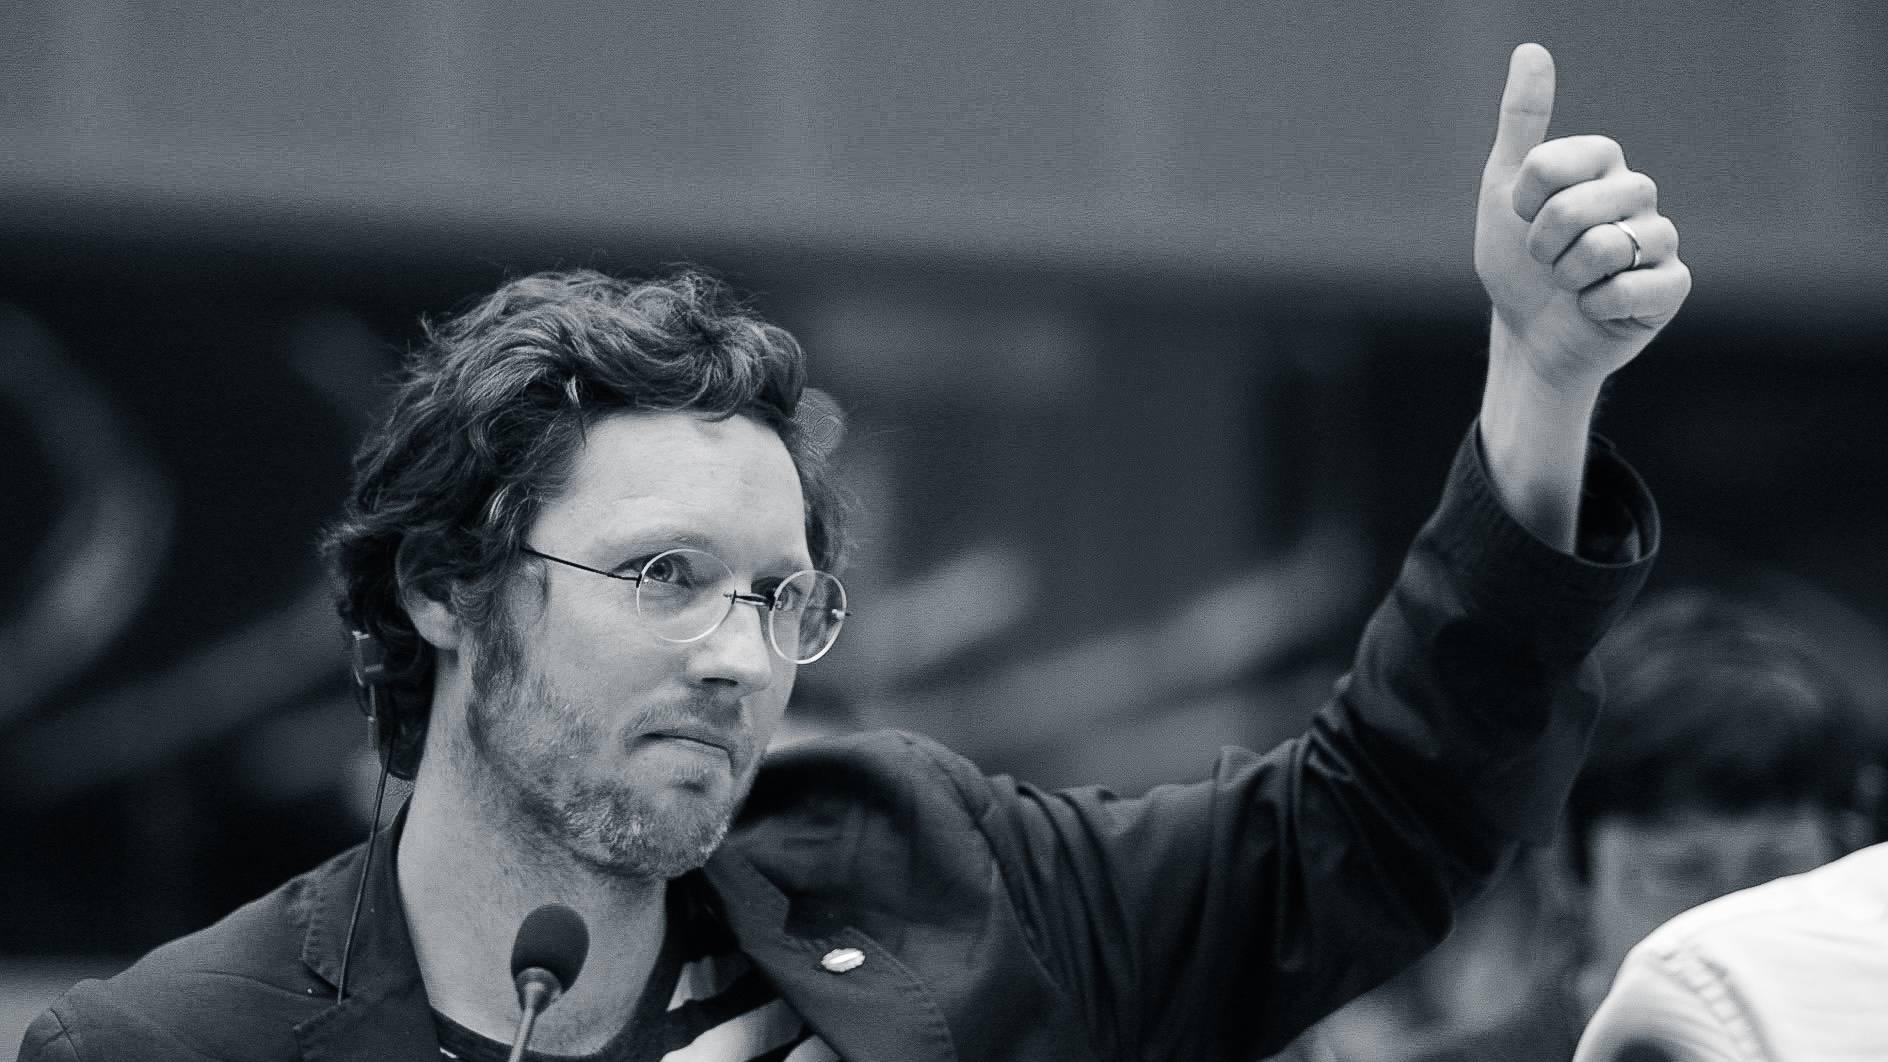 Albrecht-Democracy